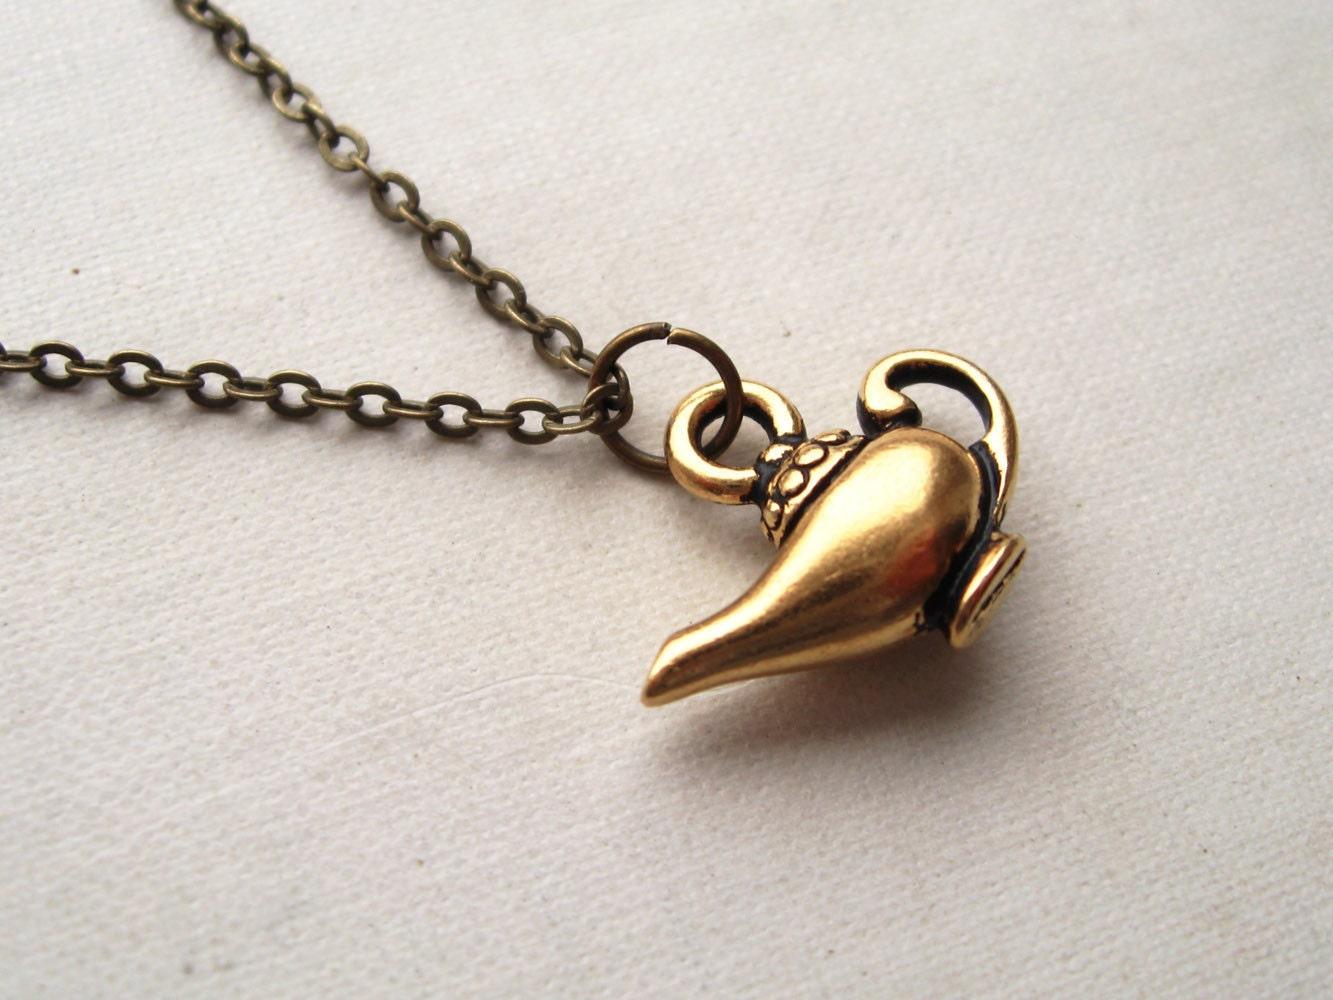 Aladdin S Lamp Necklace Arabian Nights Charm Necklace